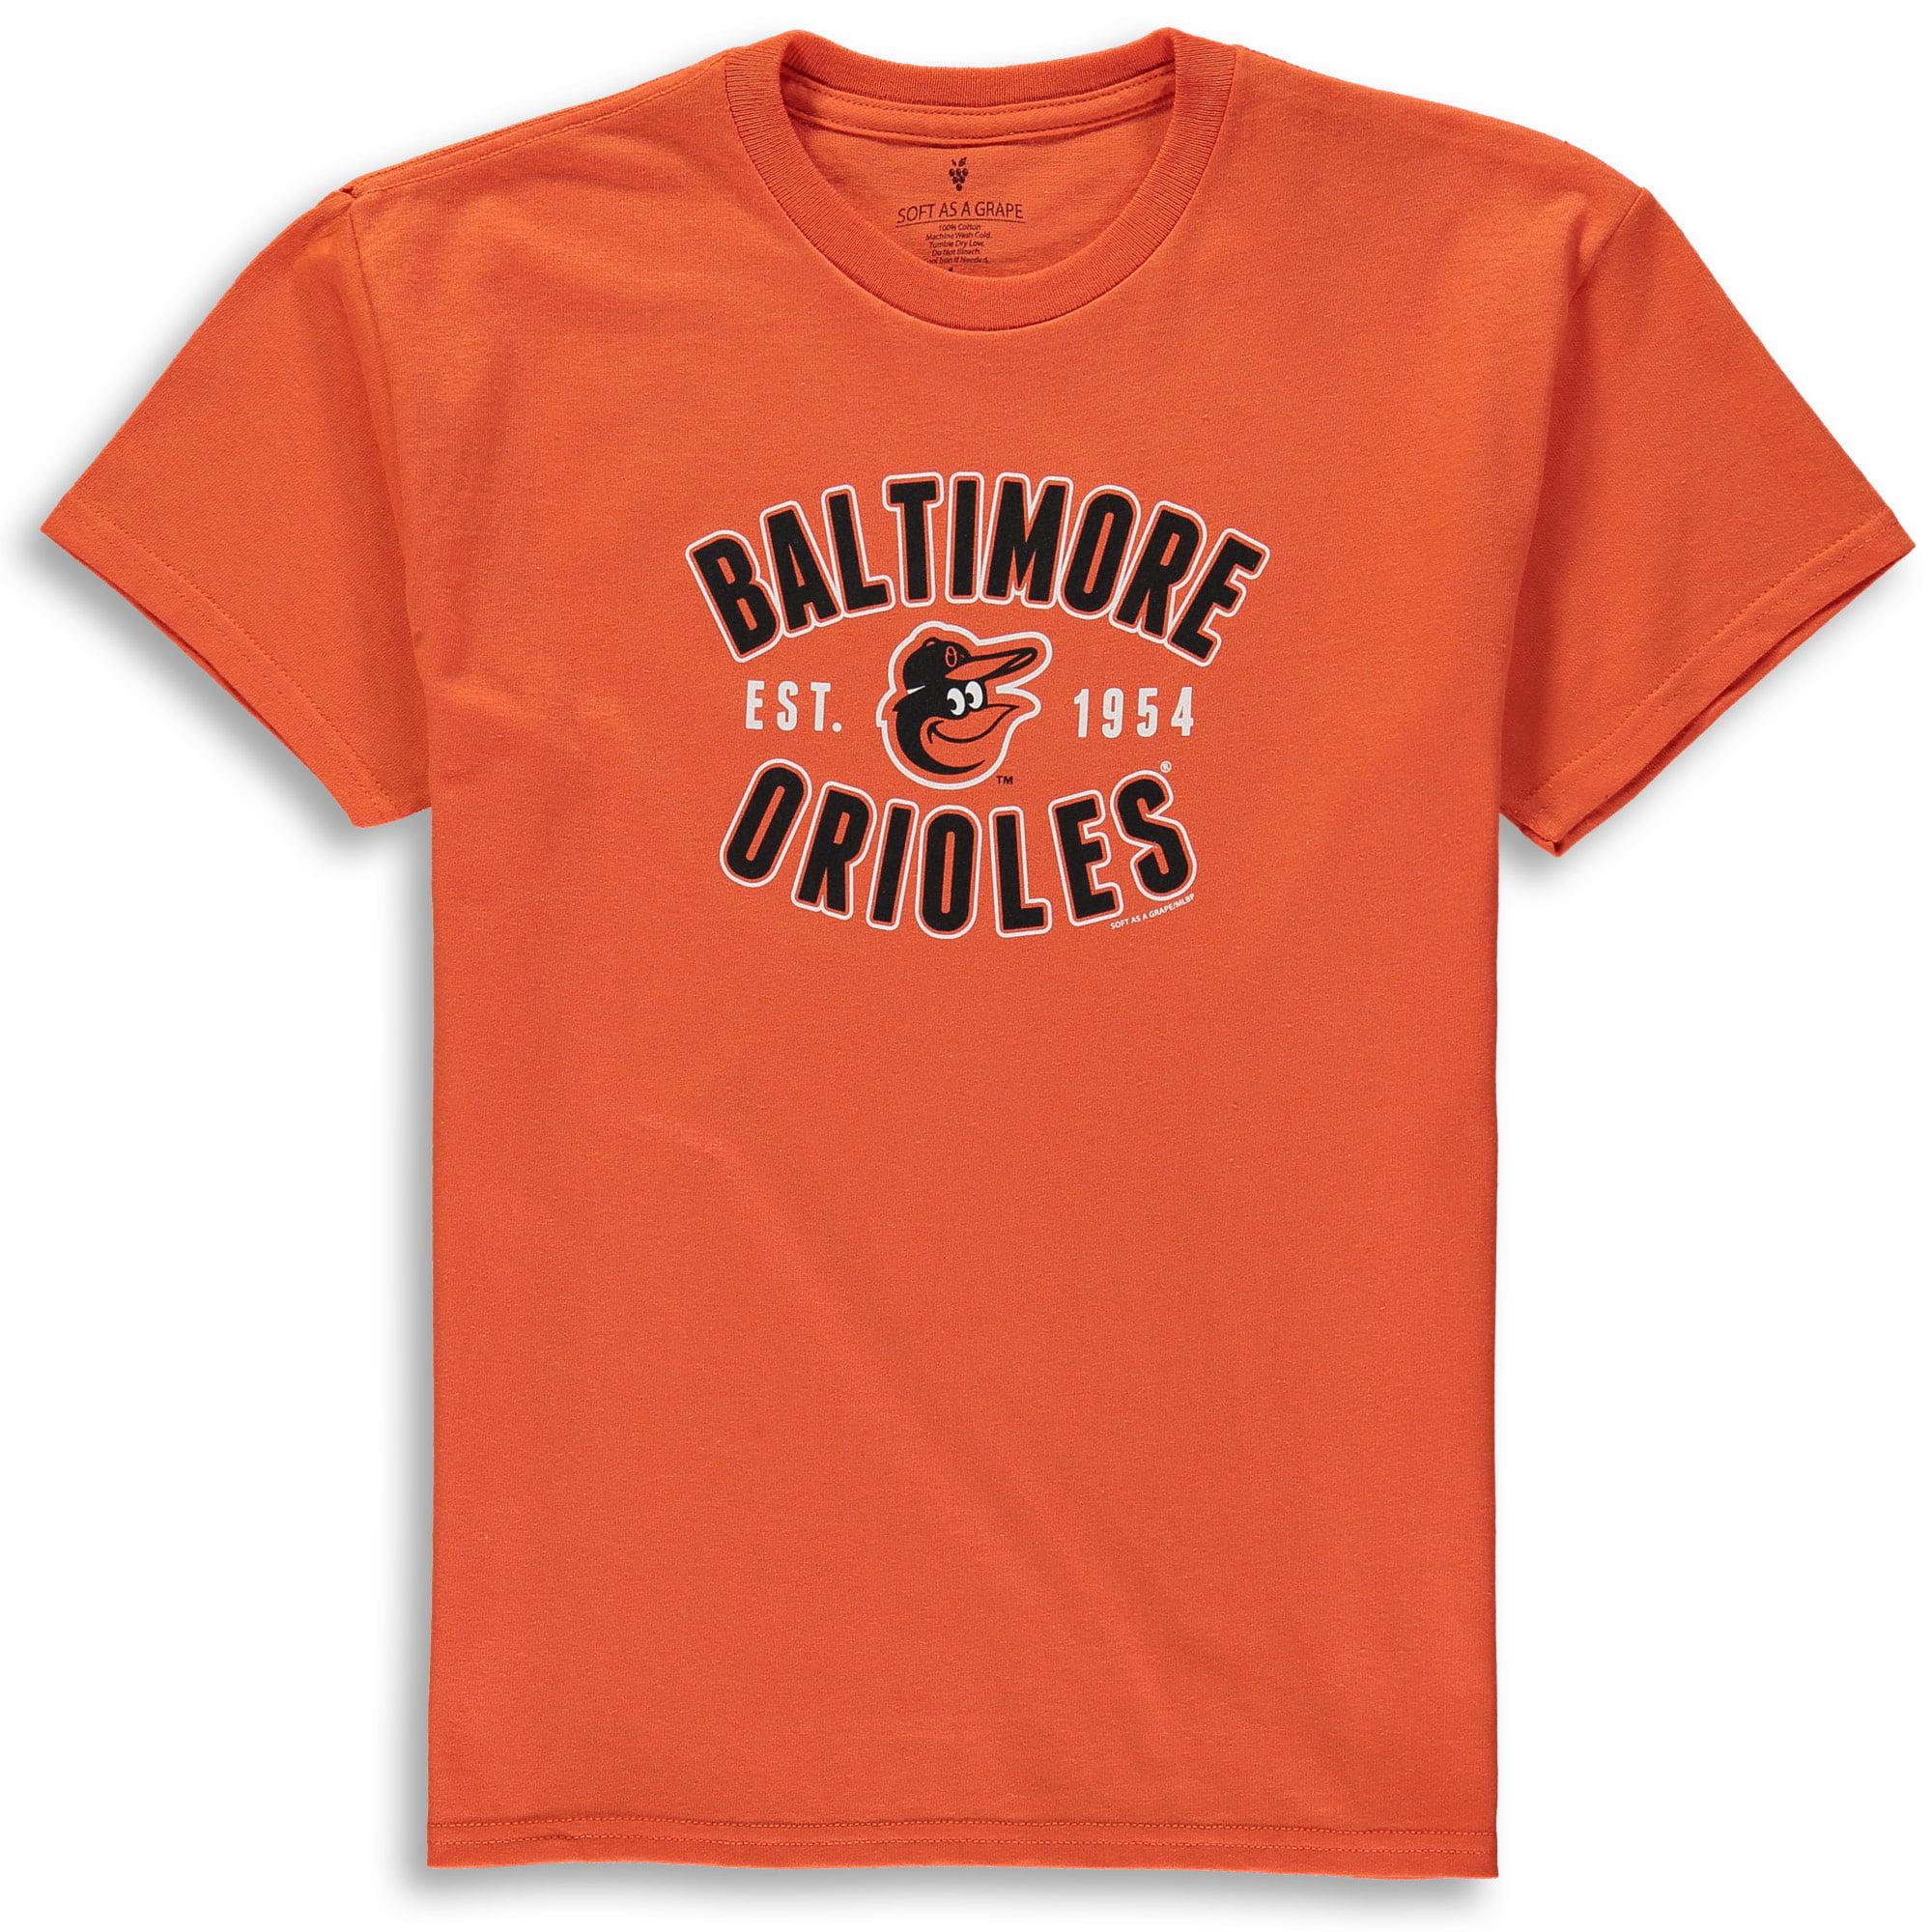 Baltimore Orioles Soft as a Grape Youth Cotton Crew Neck T-Shirt - Orange